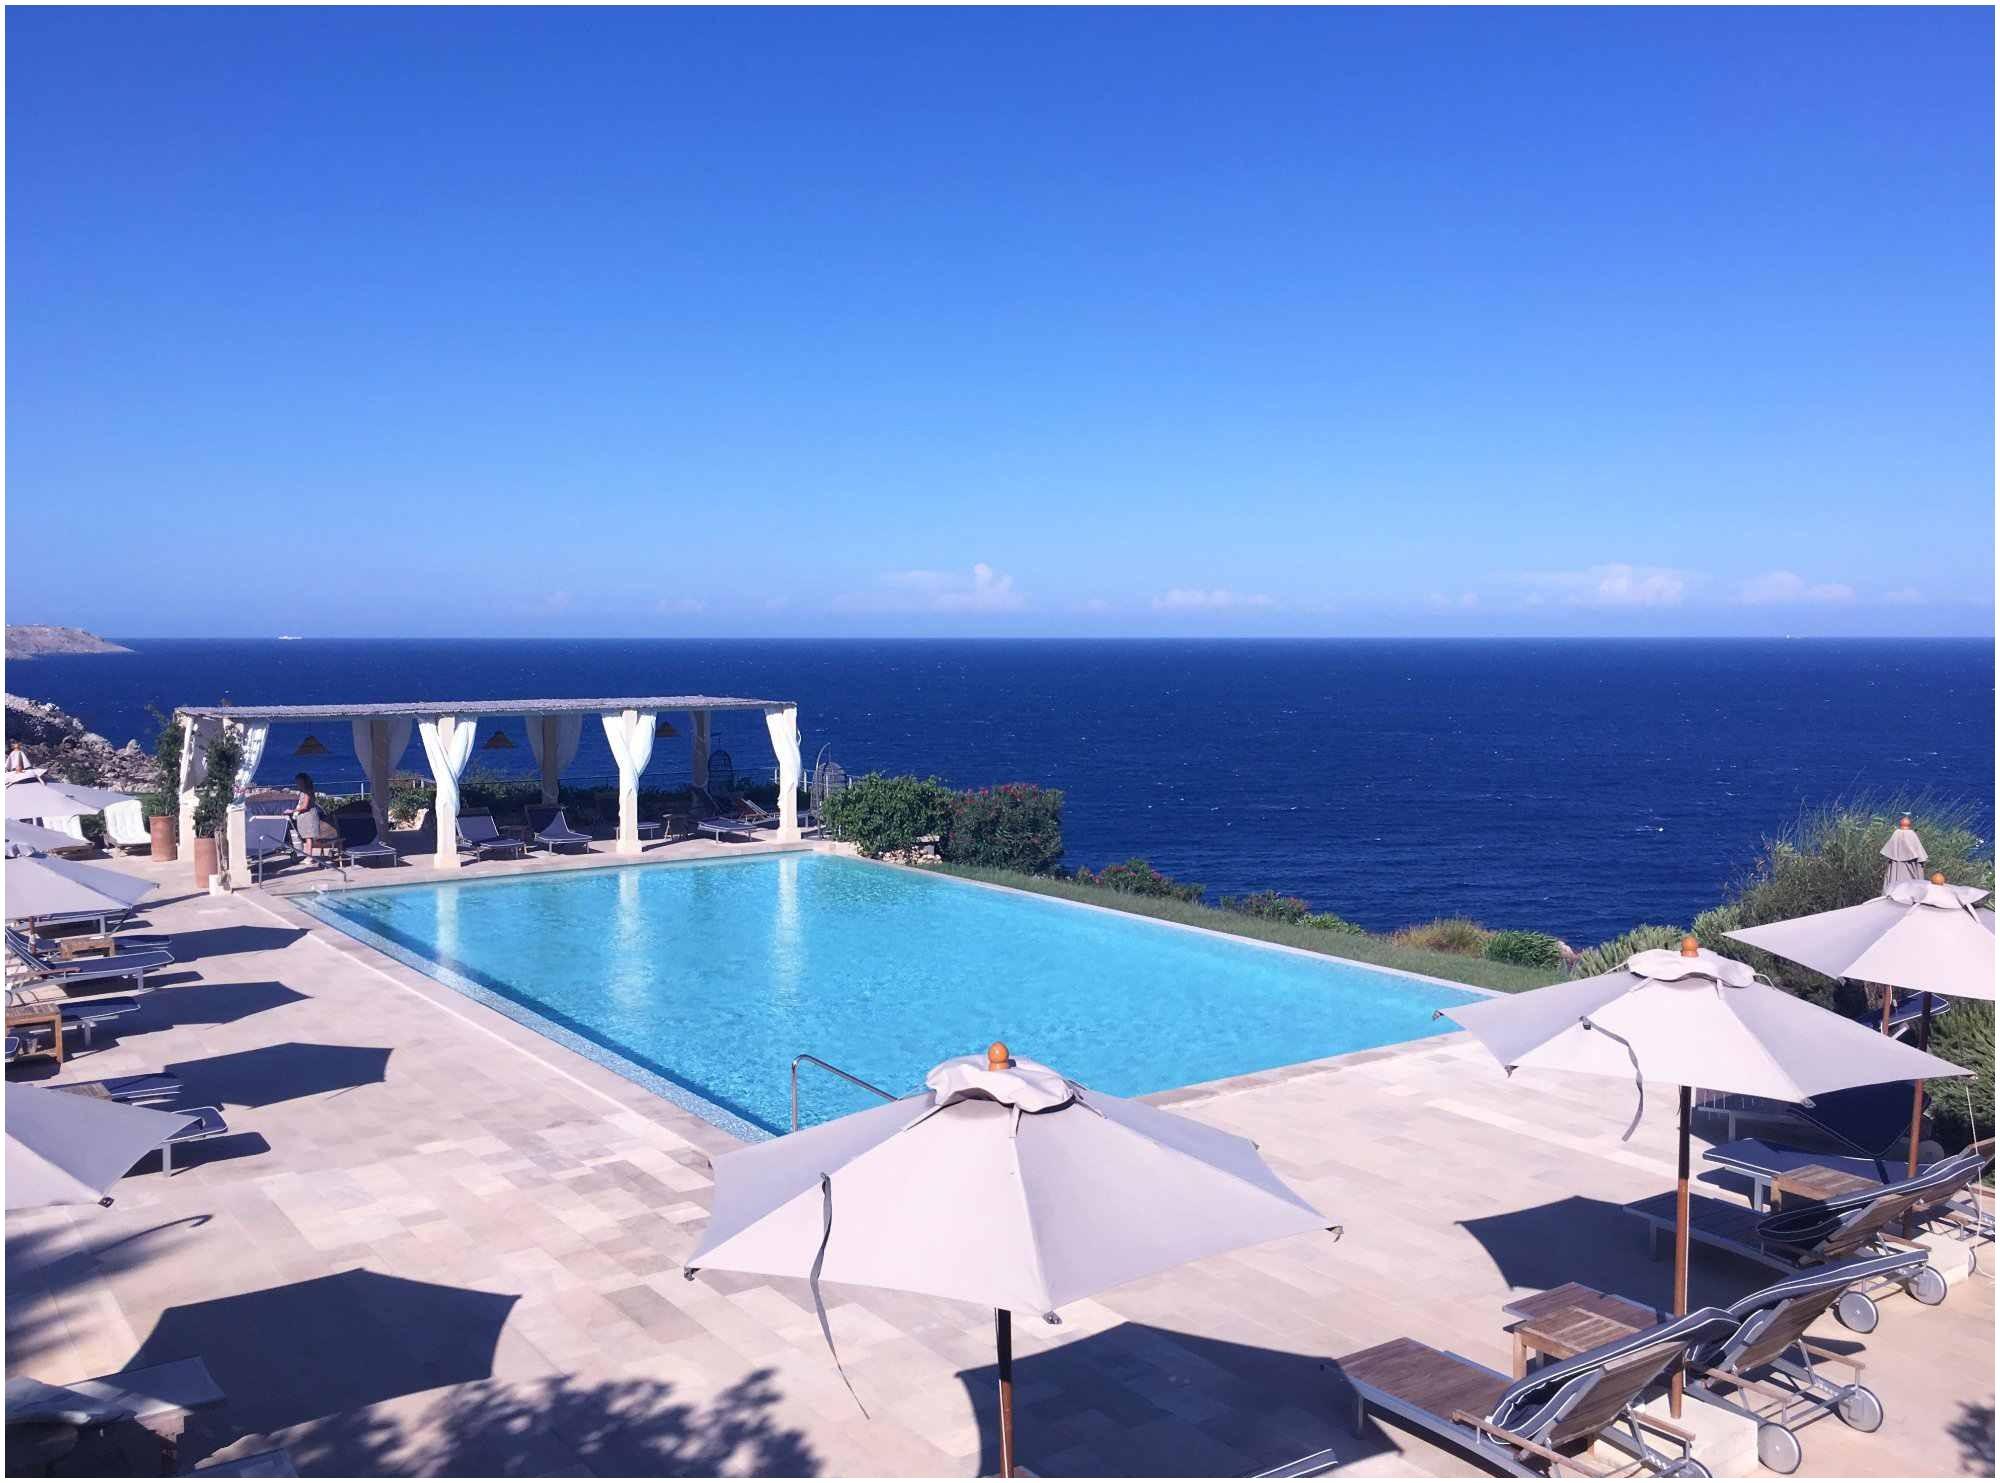 Best for Luxury Le Capase Resort Salento